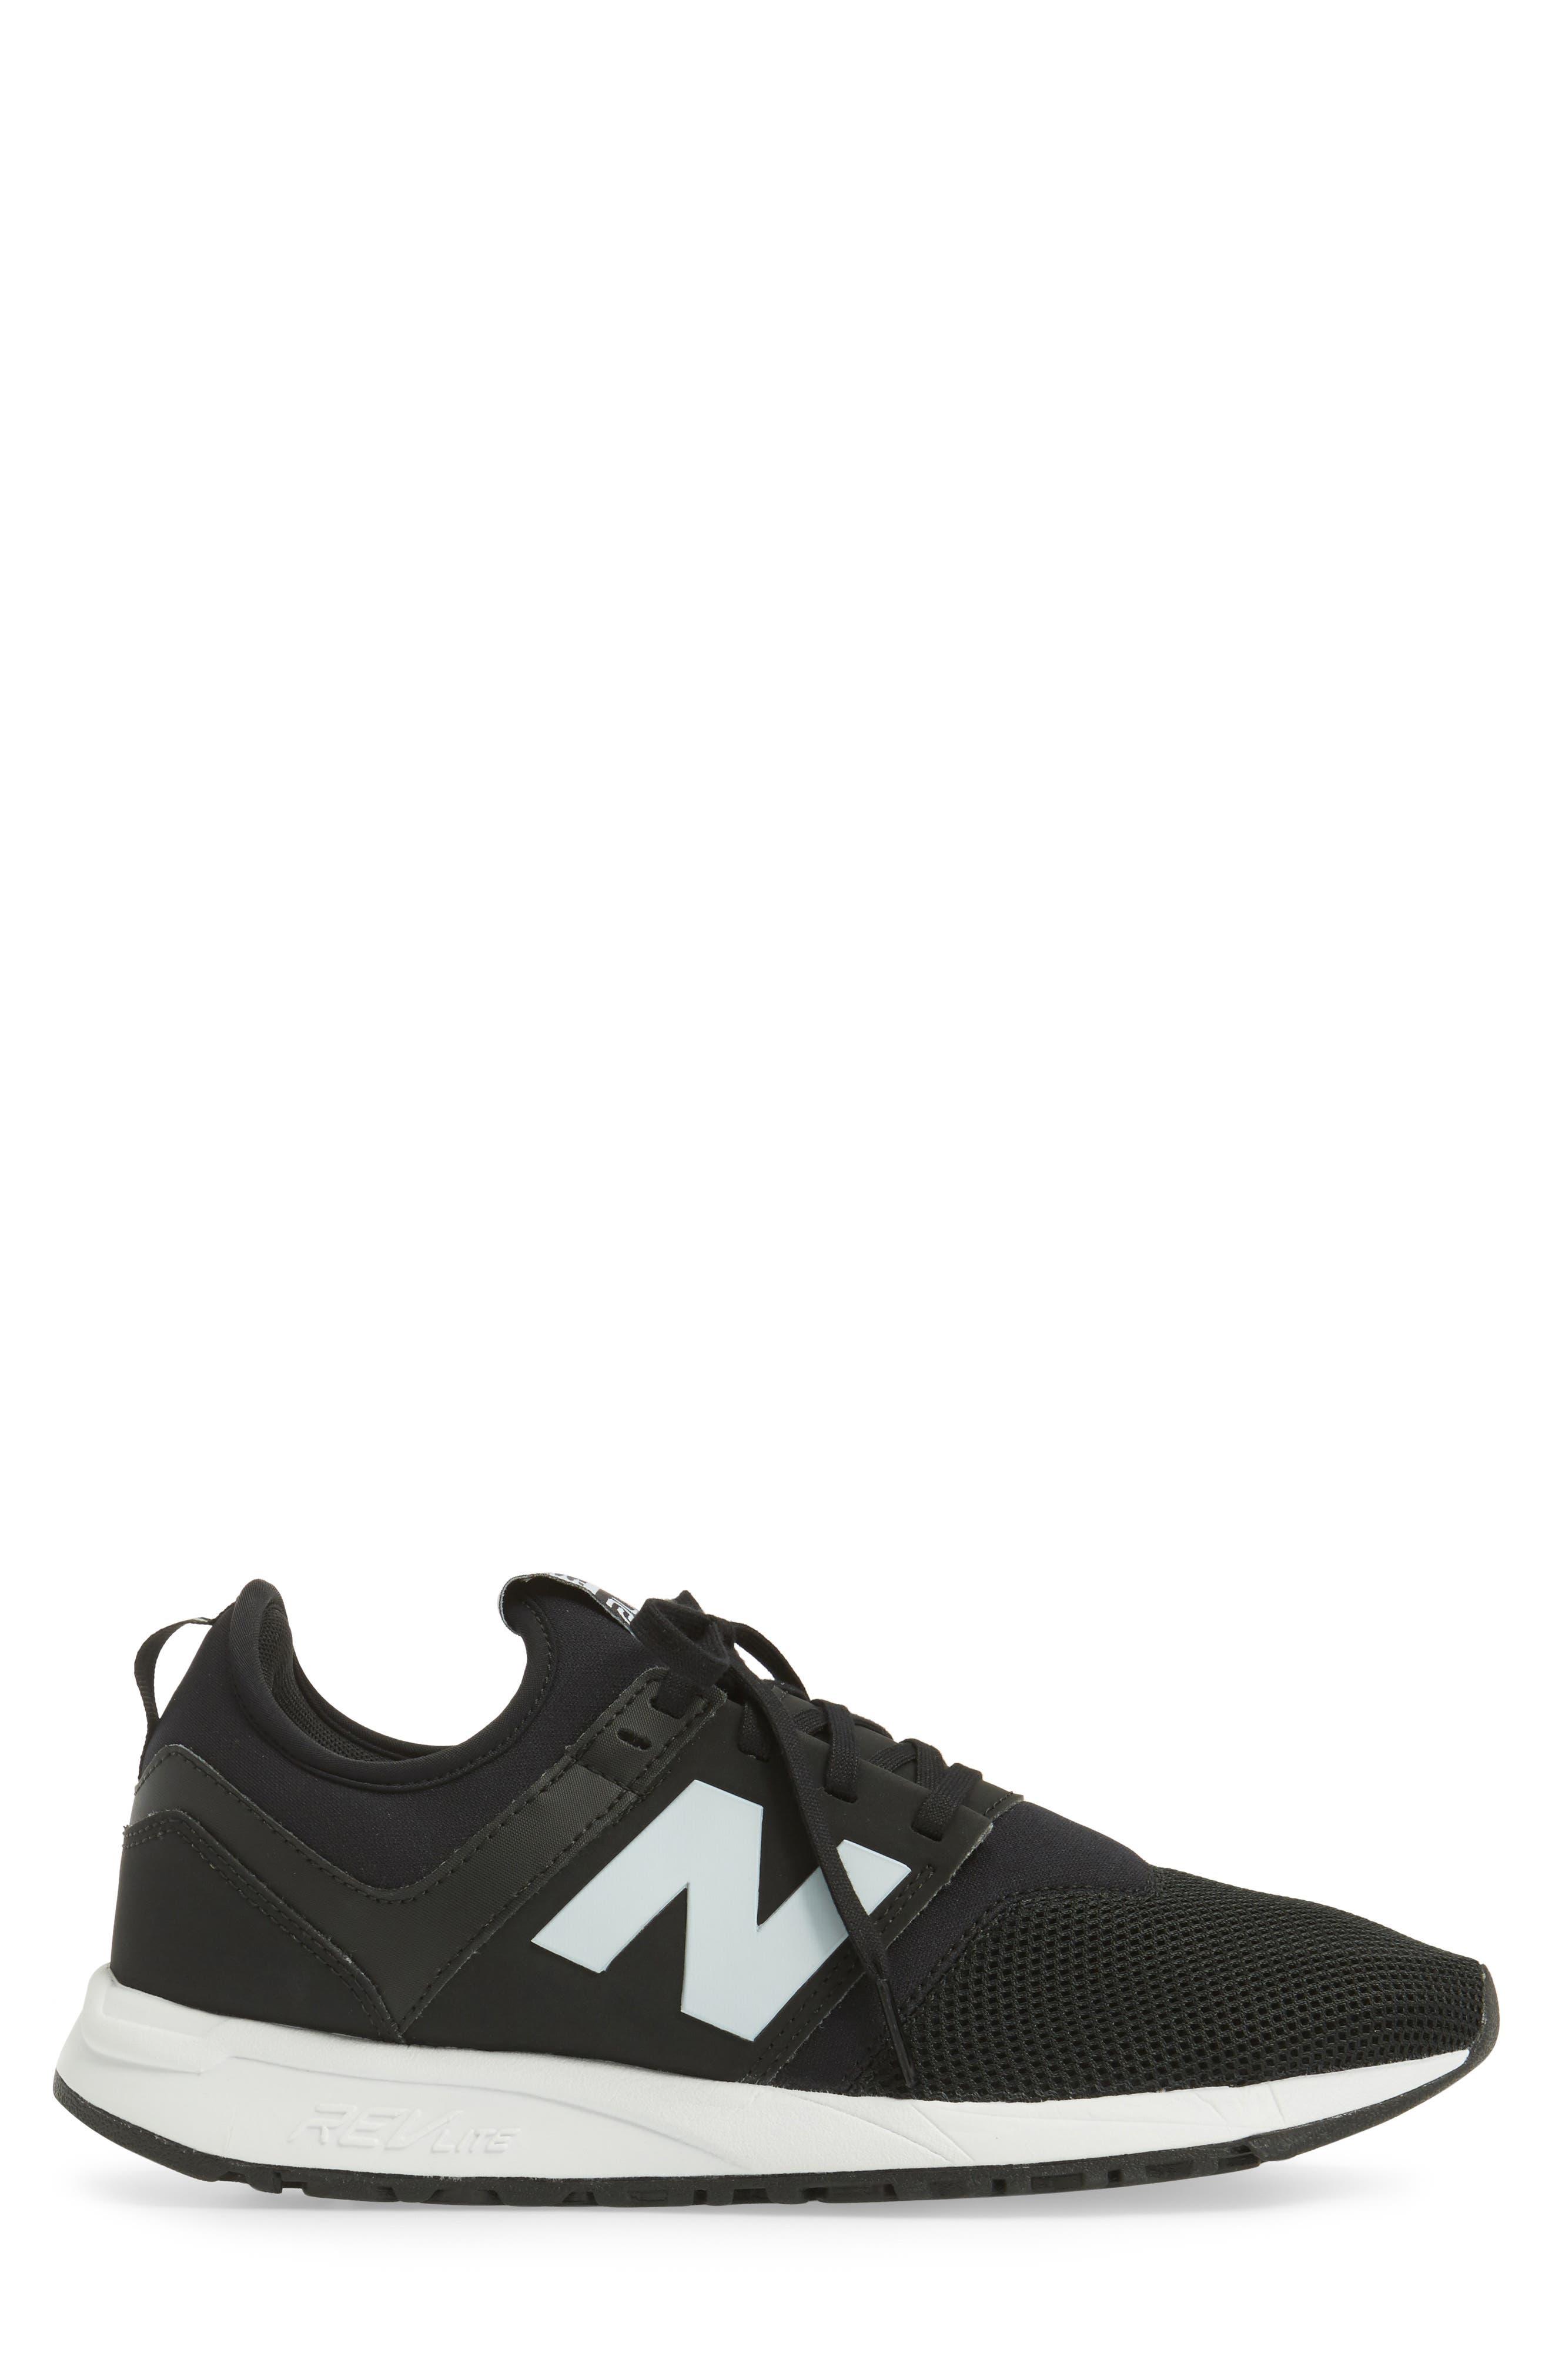 247 Modern Classic Sneaker,                             Alternate thumbnail 3, color,                             001